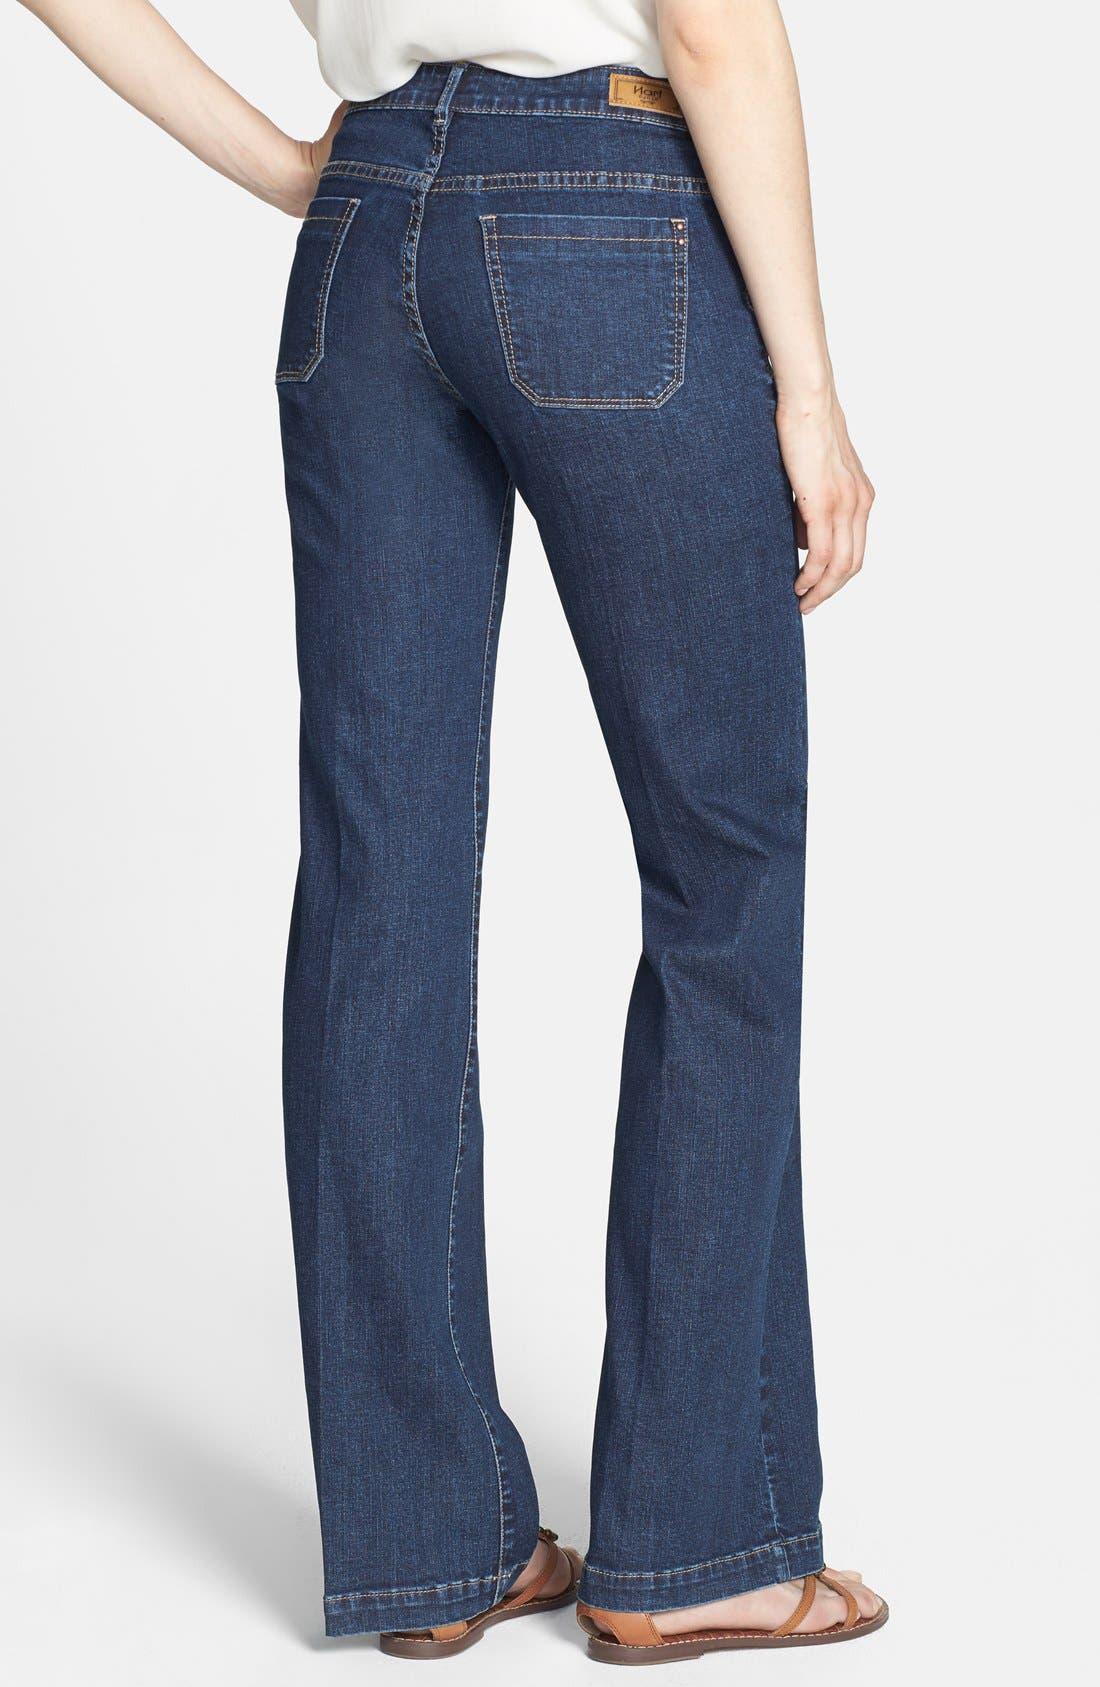 Alternate Image 2  - HART Denim 'Pheona' Wide Leg Trouser Jeans (Carbon) (Juniors)